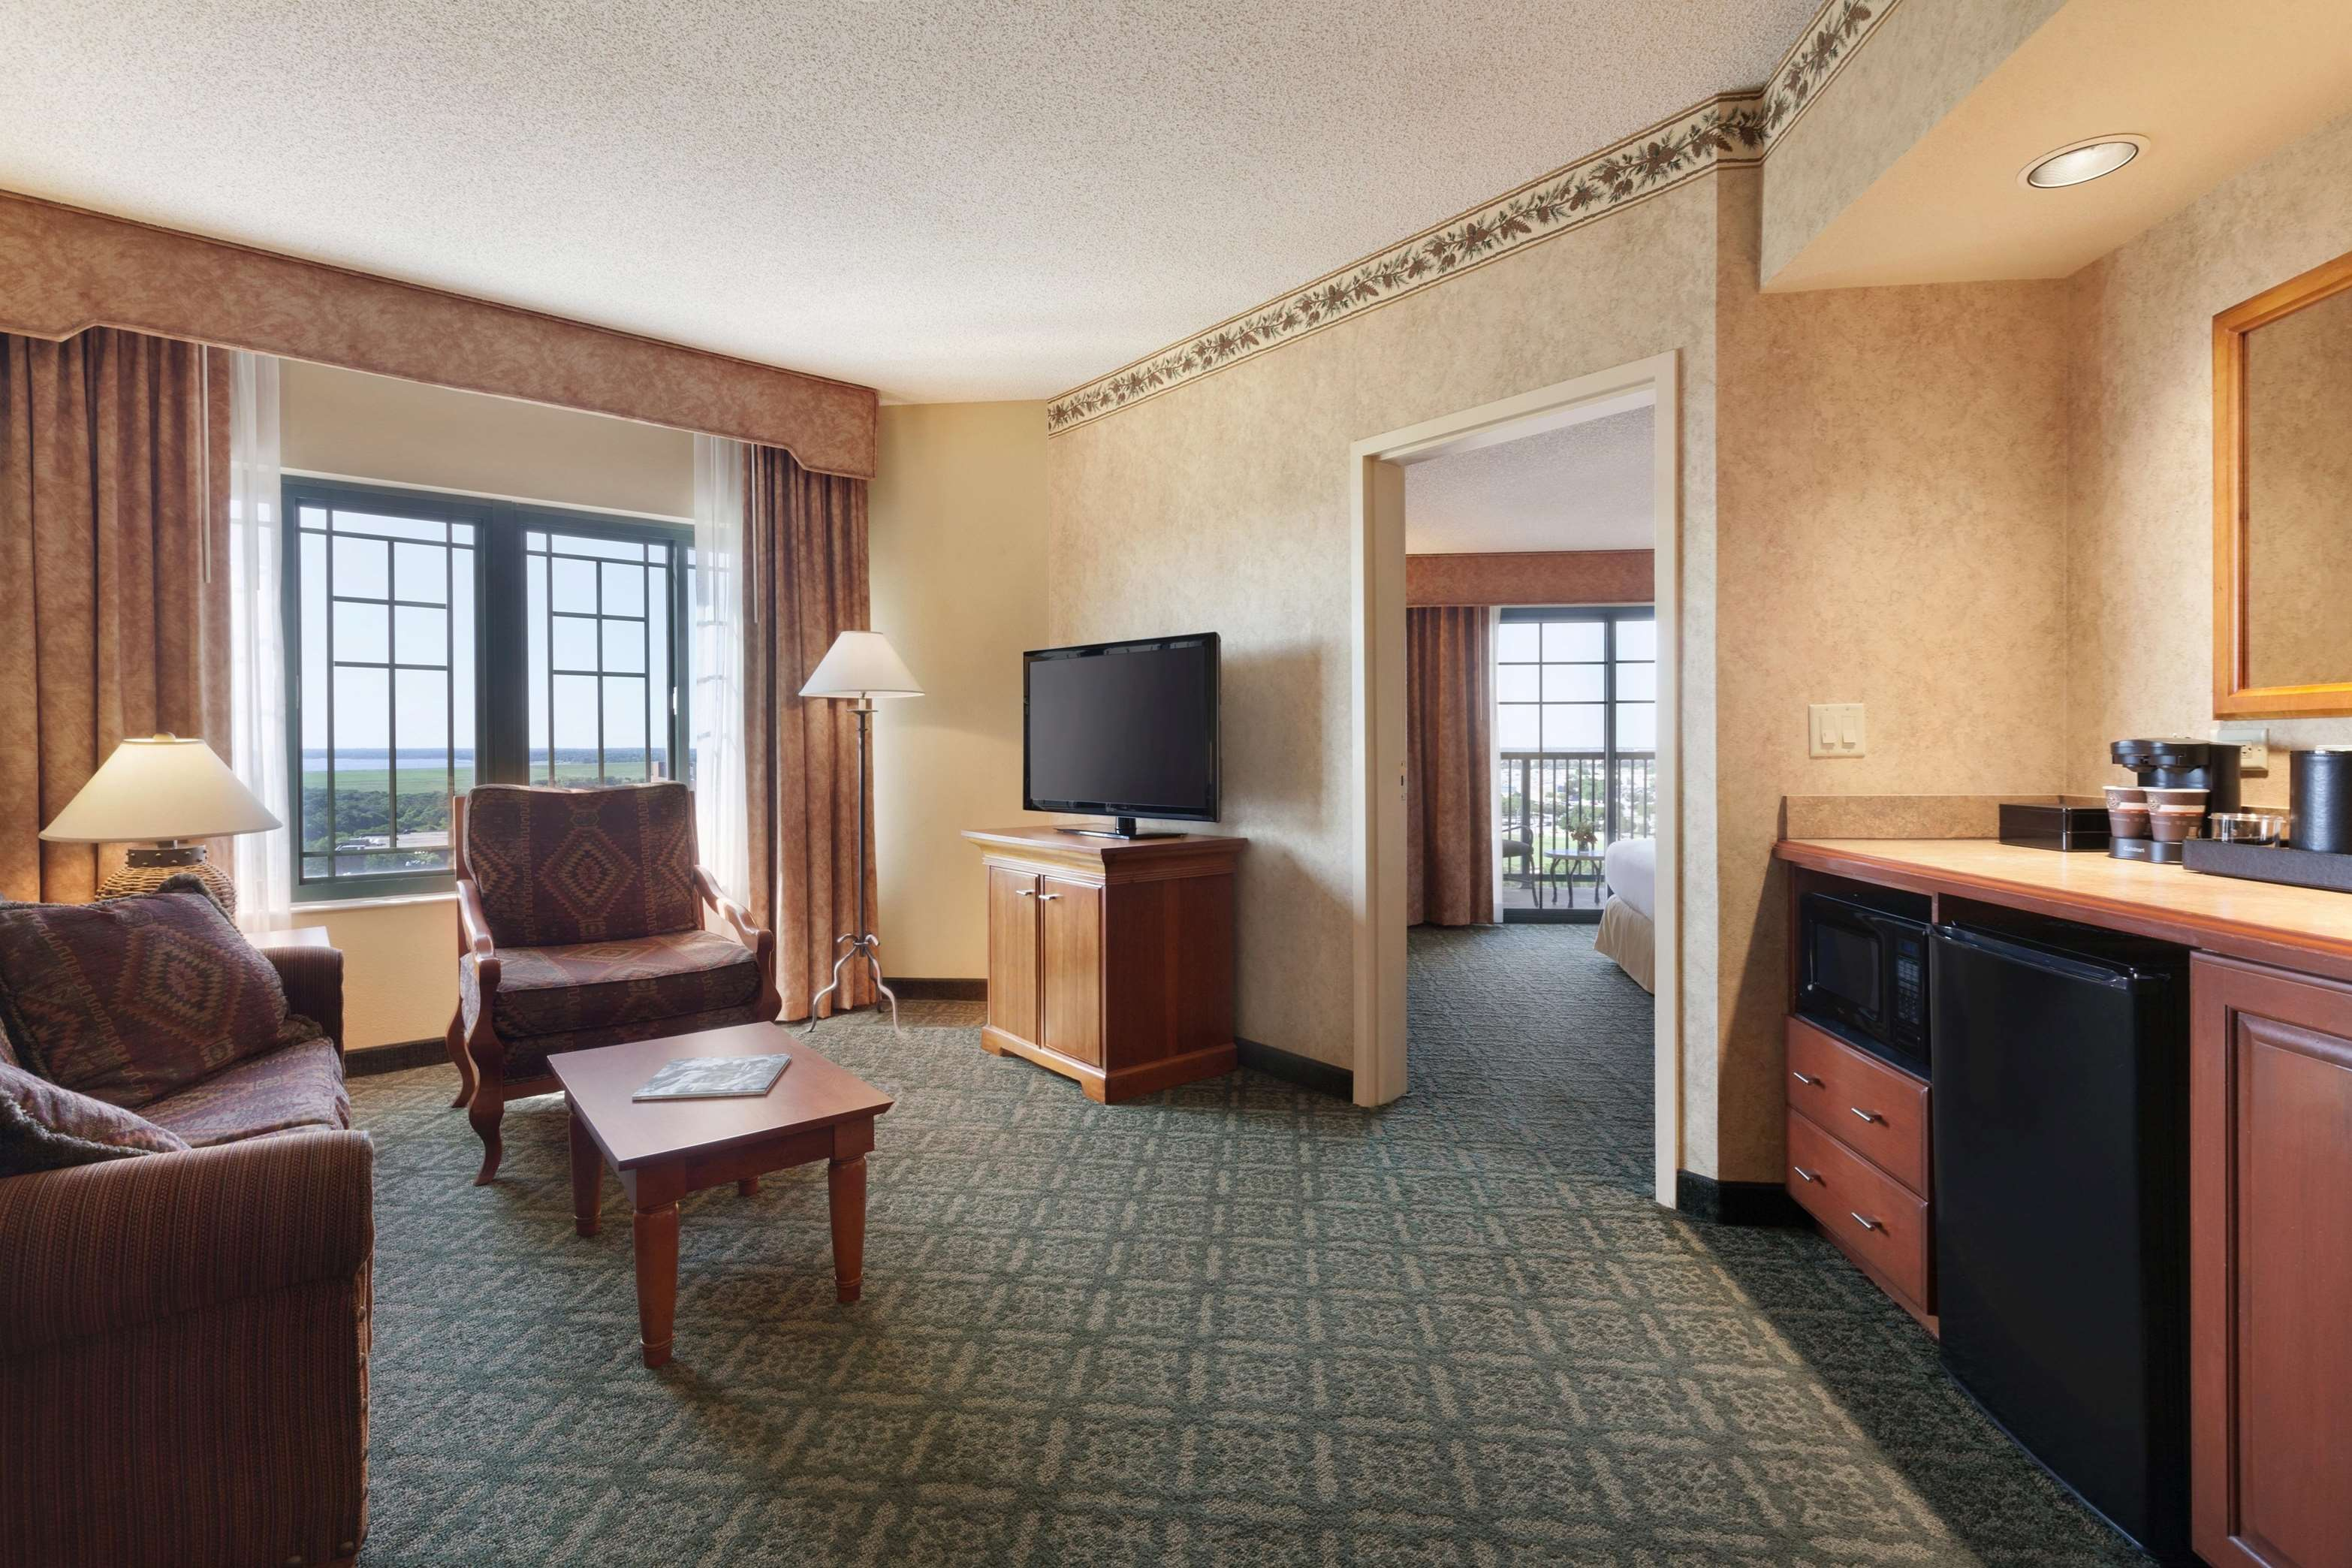 Embassy Suites Conference Room Rental